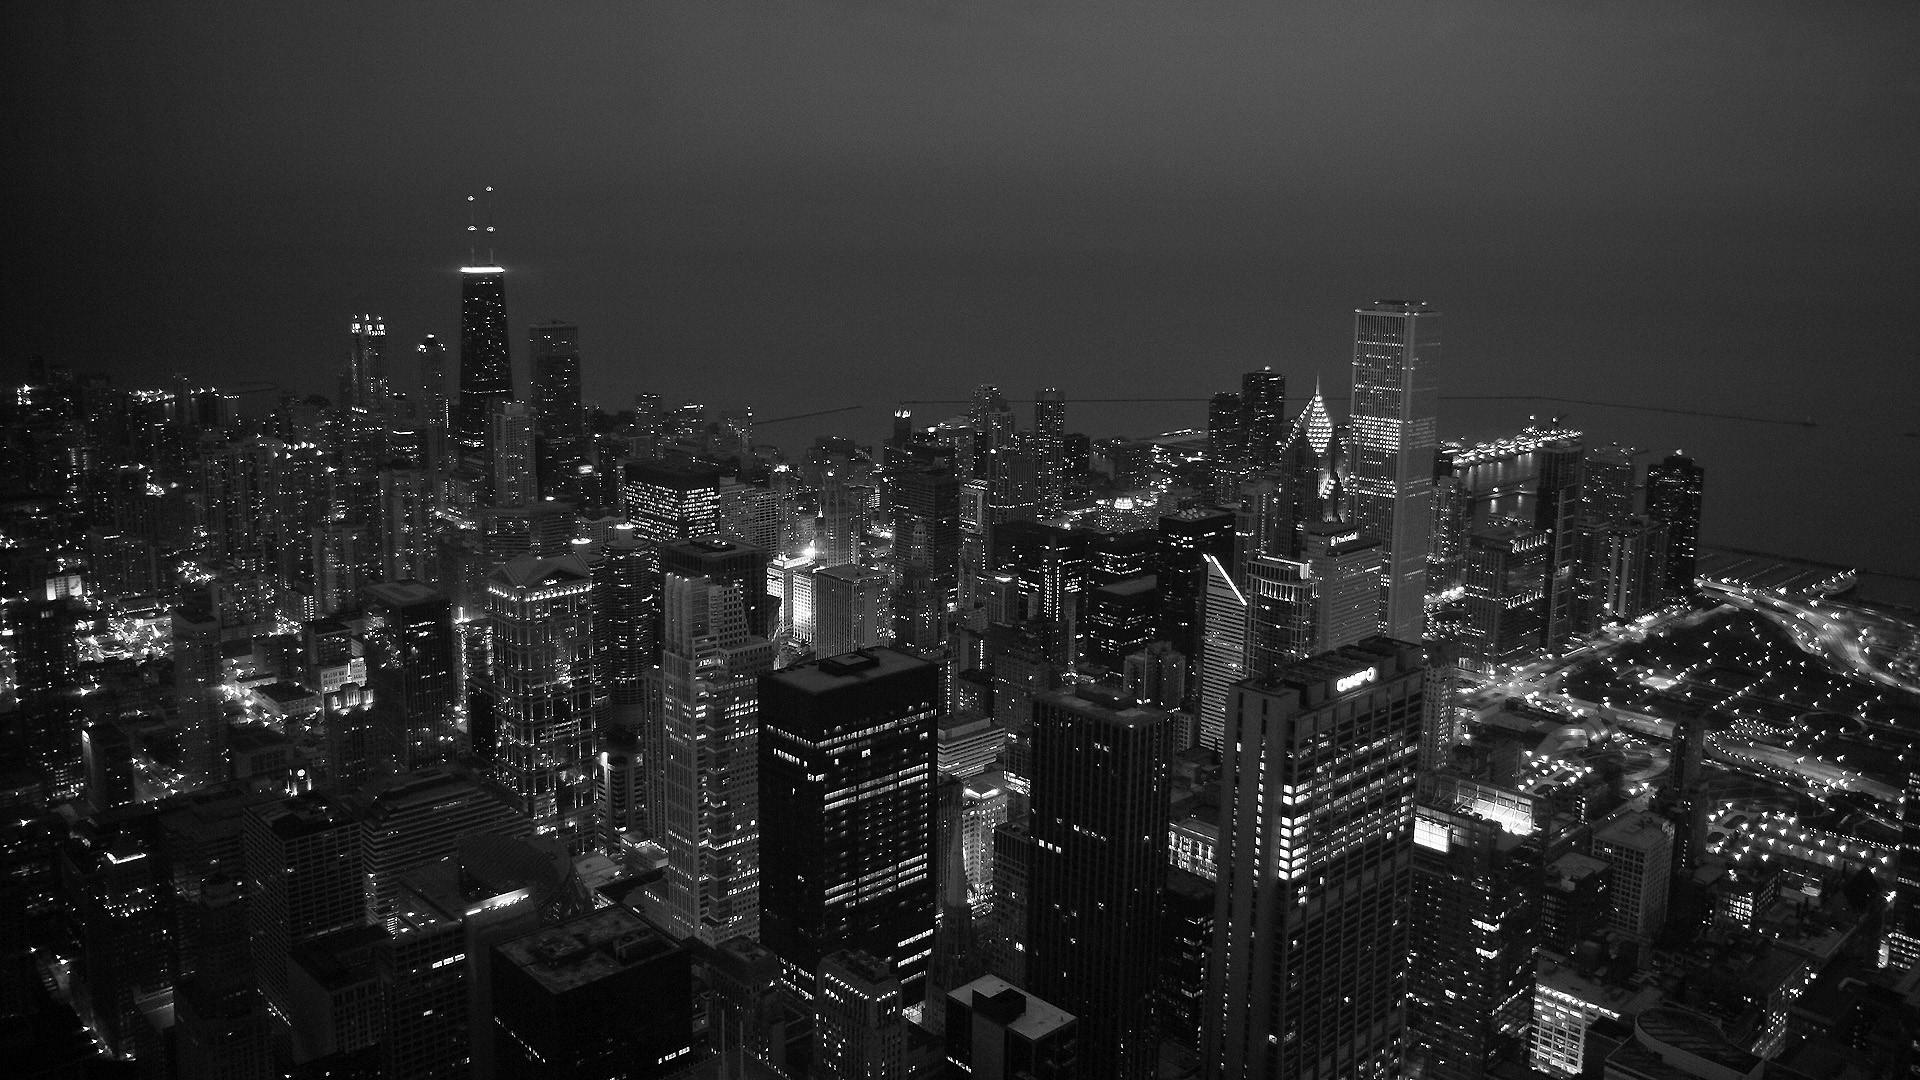 City 14